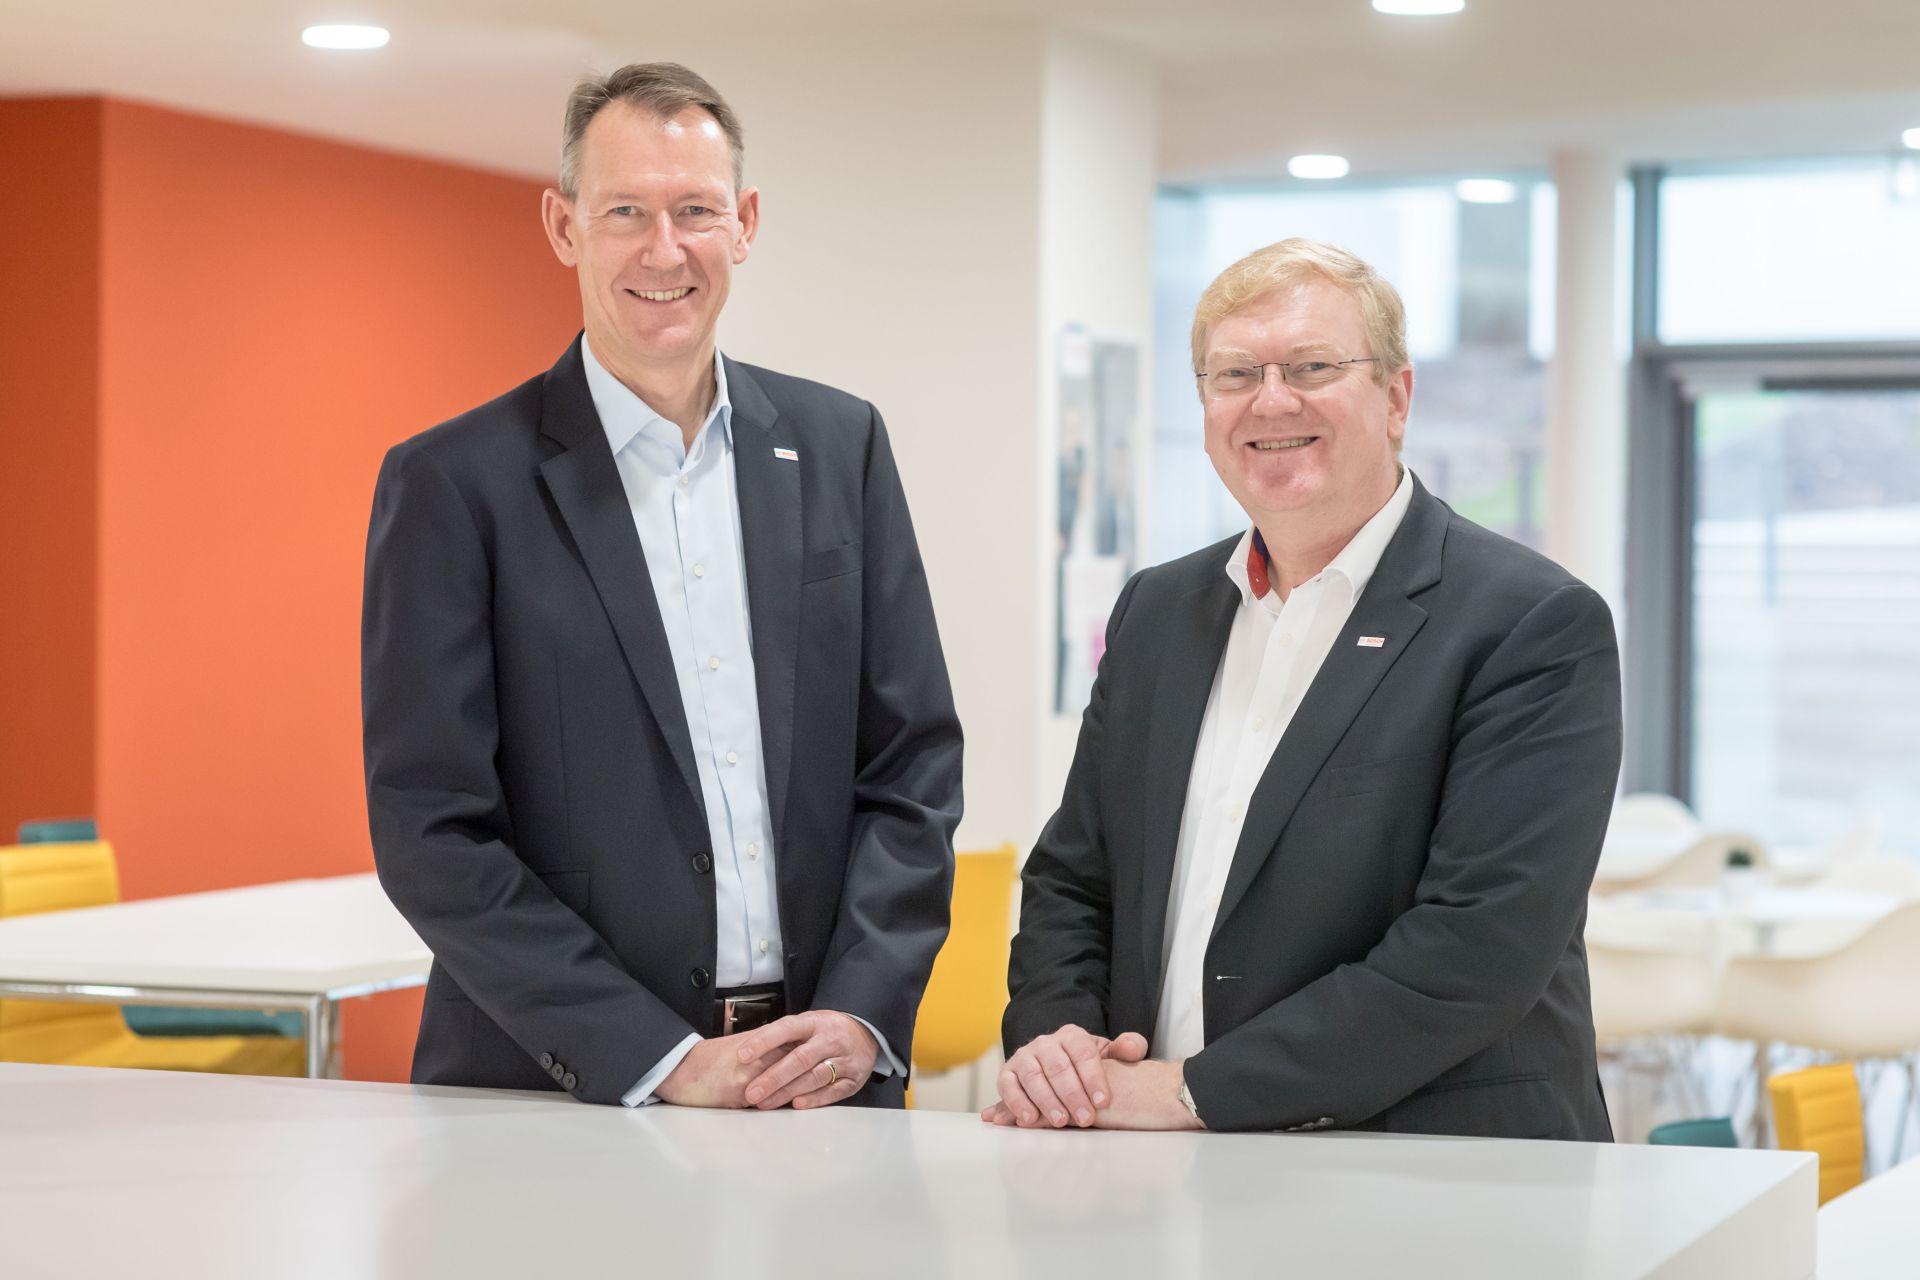 Bosch se dezvolta cu solutii conectate pentru sisteme energetice si cladiri   Cheia dezvoltarii viitoare: inteligenta artificiala